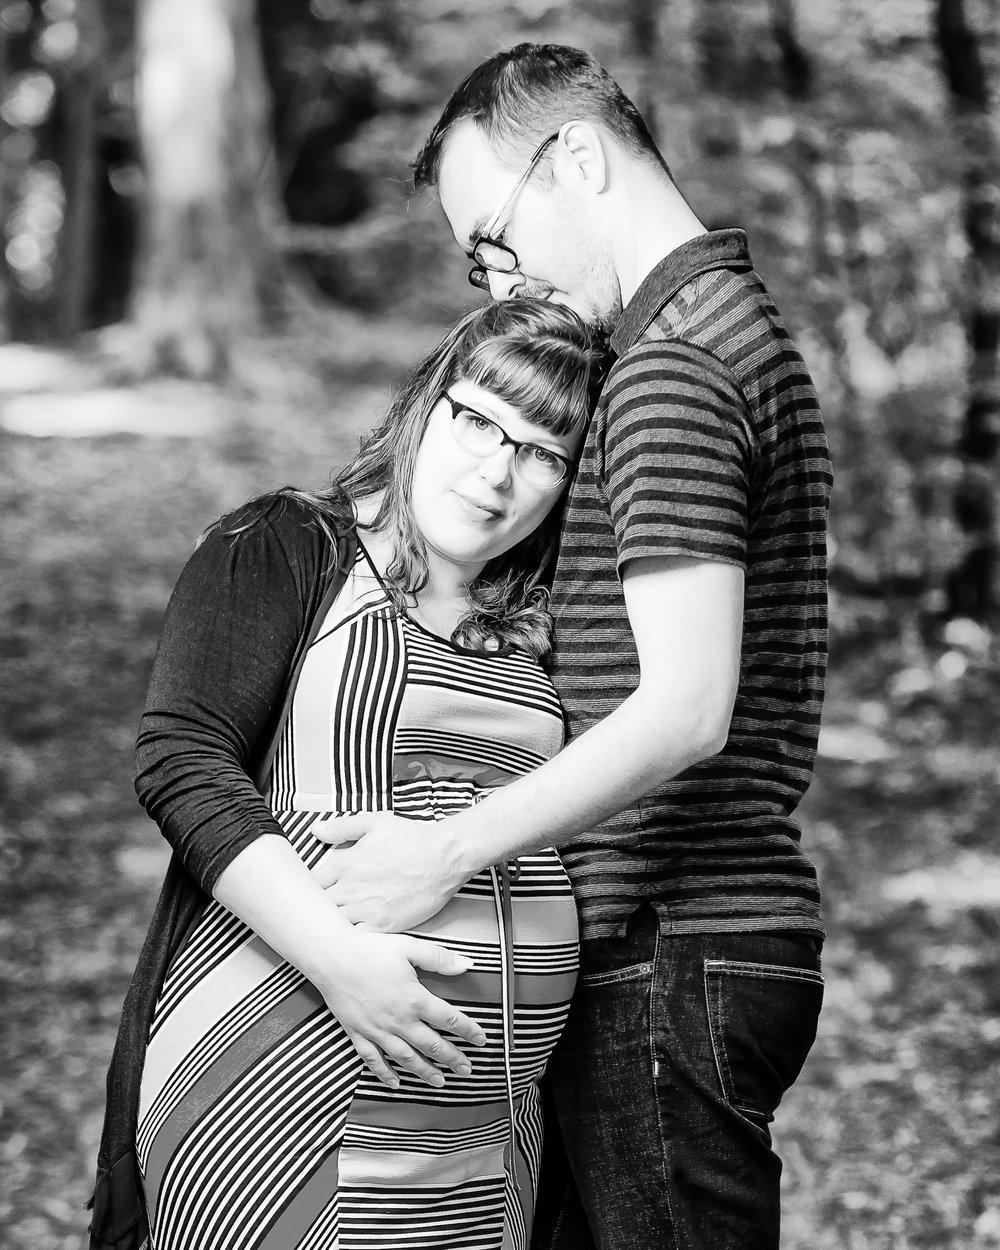 2018_June_23-06_23_2018_Ben_Anna_Maternity-48847-Edit-2.jpg